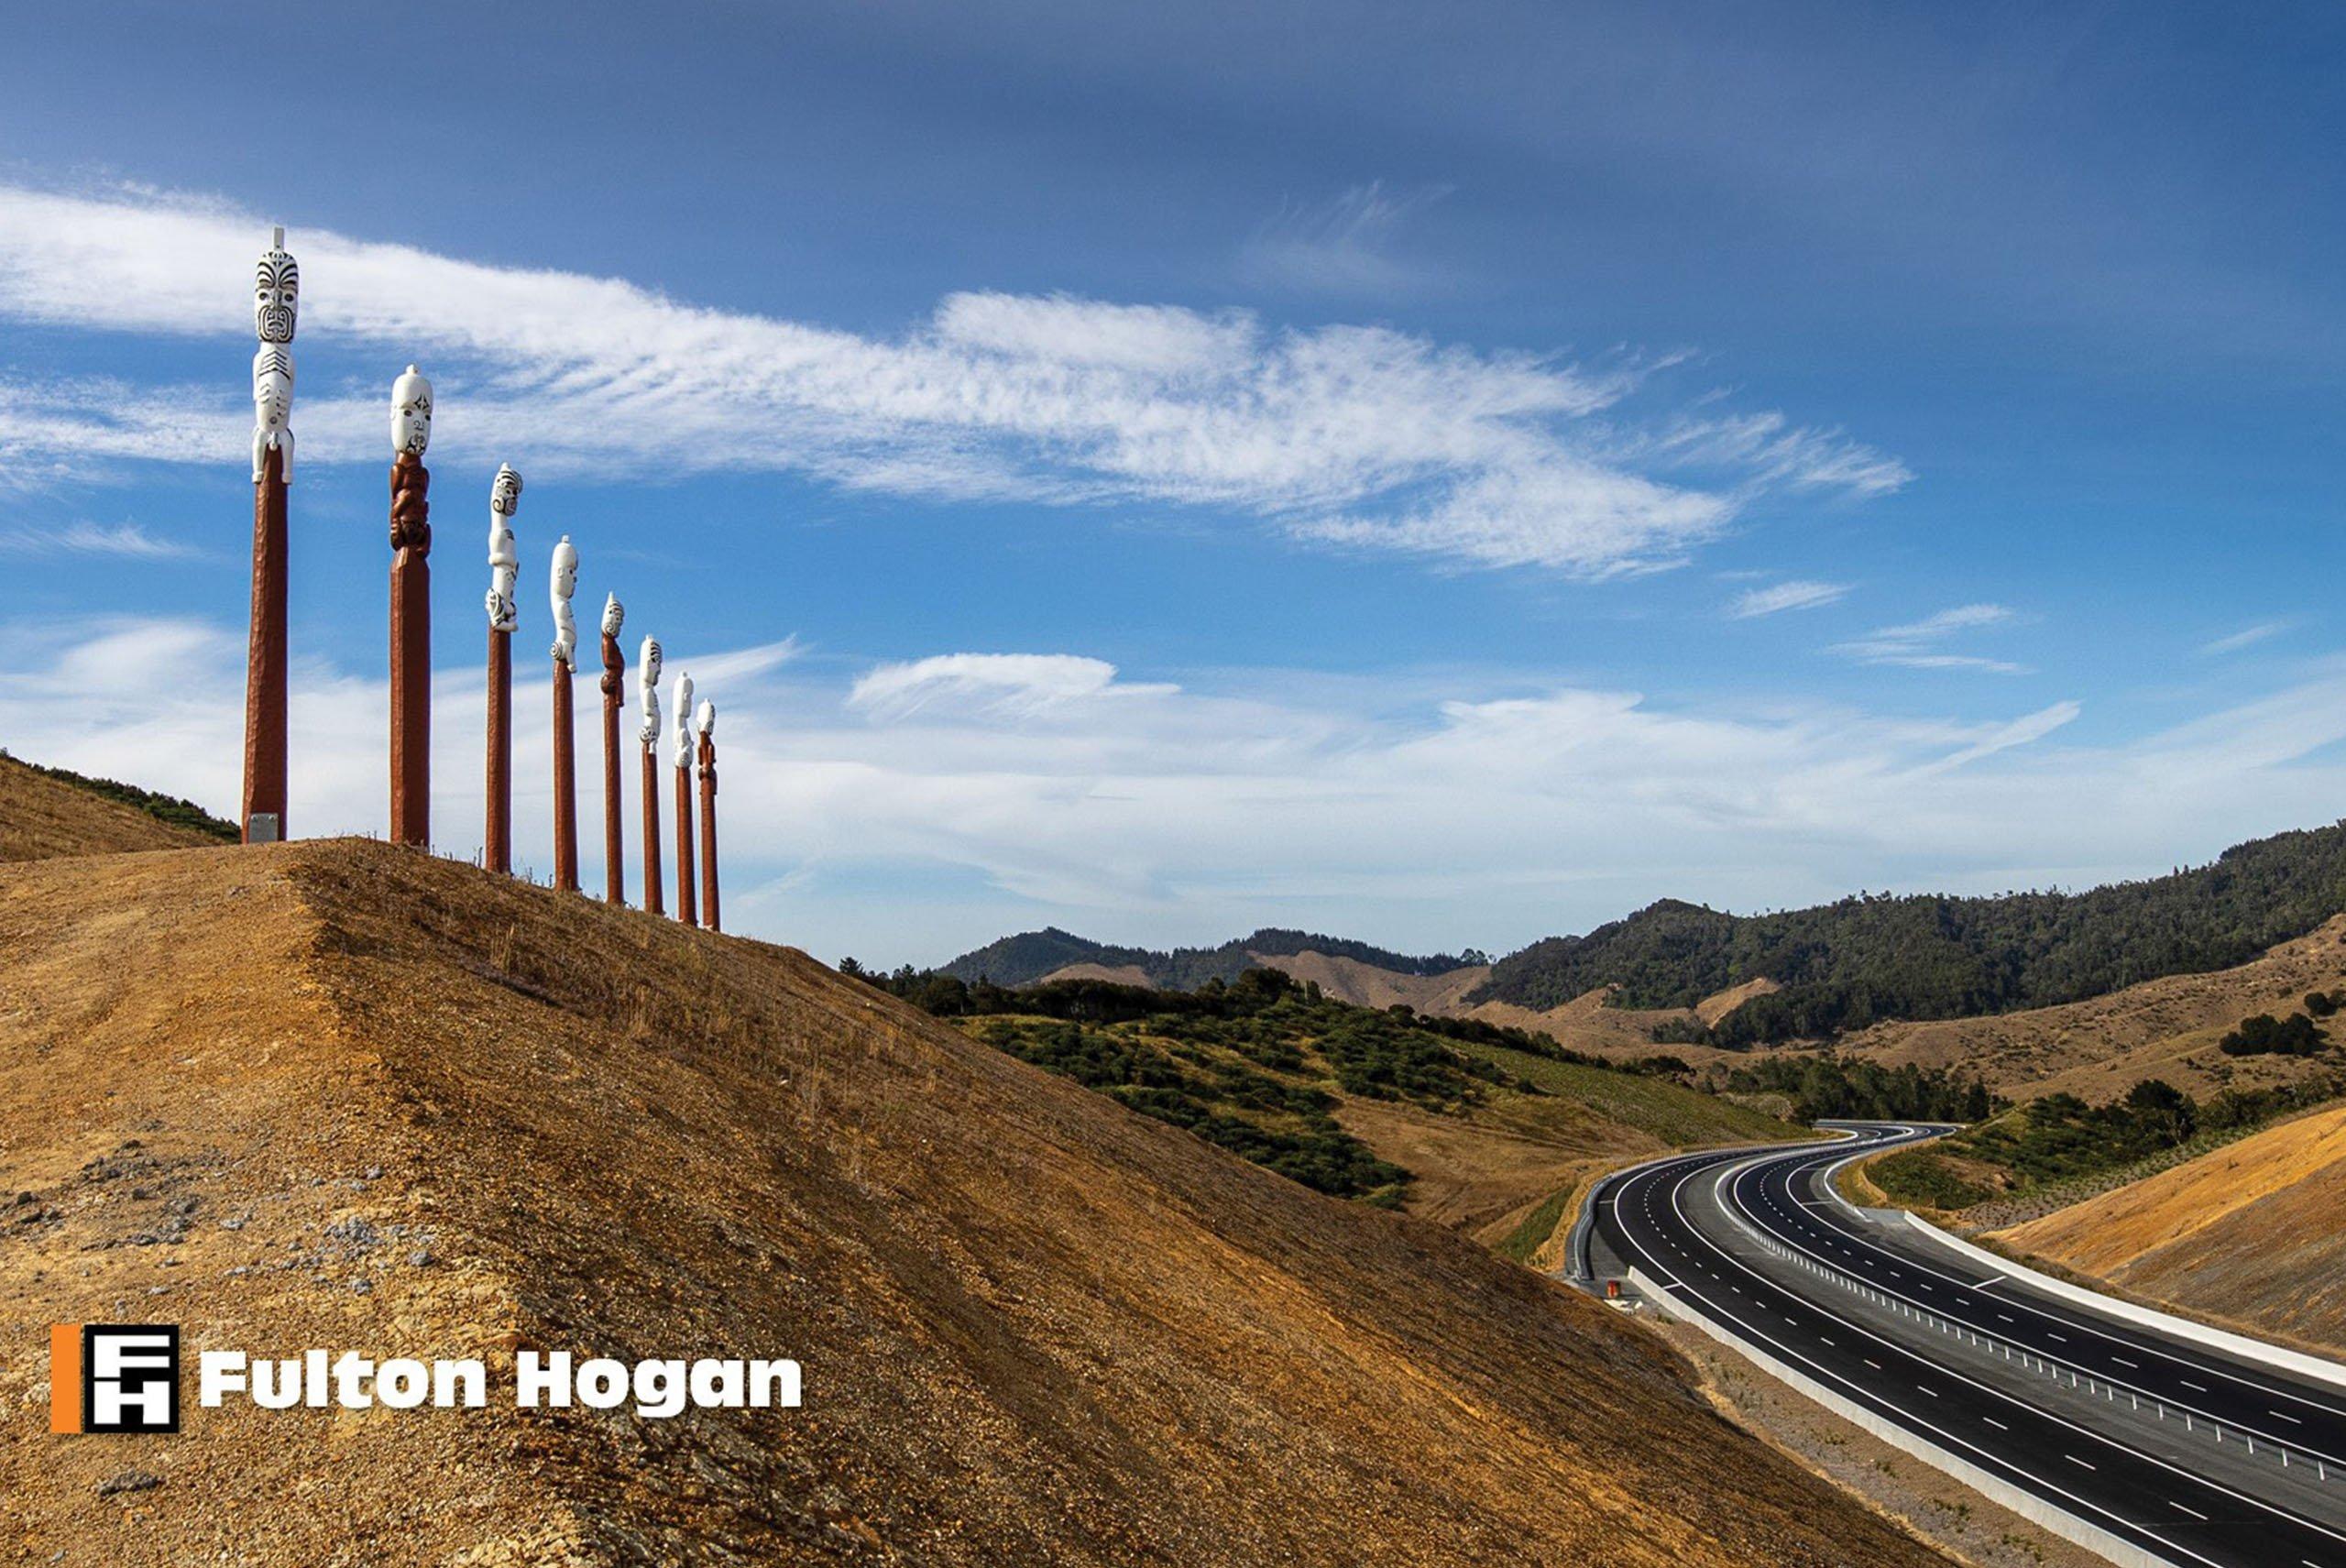 fulton-hogan-featured-image